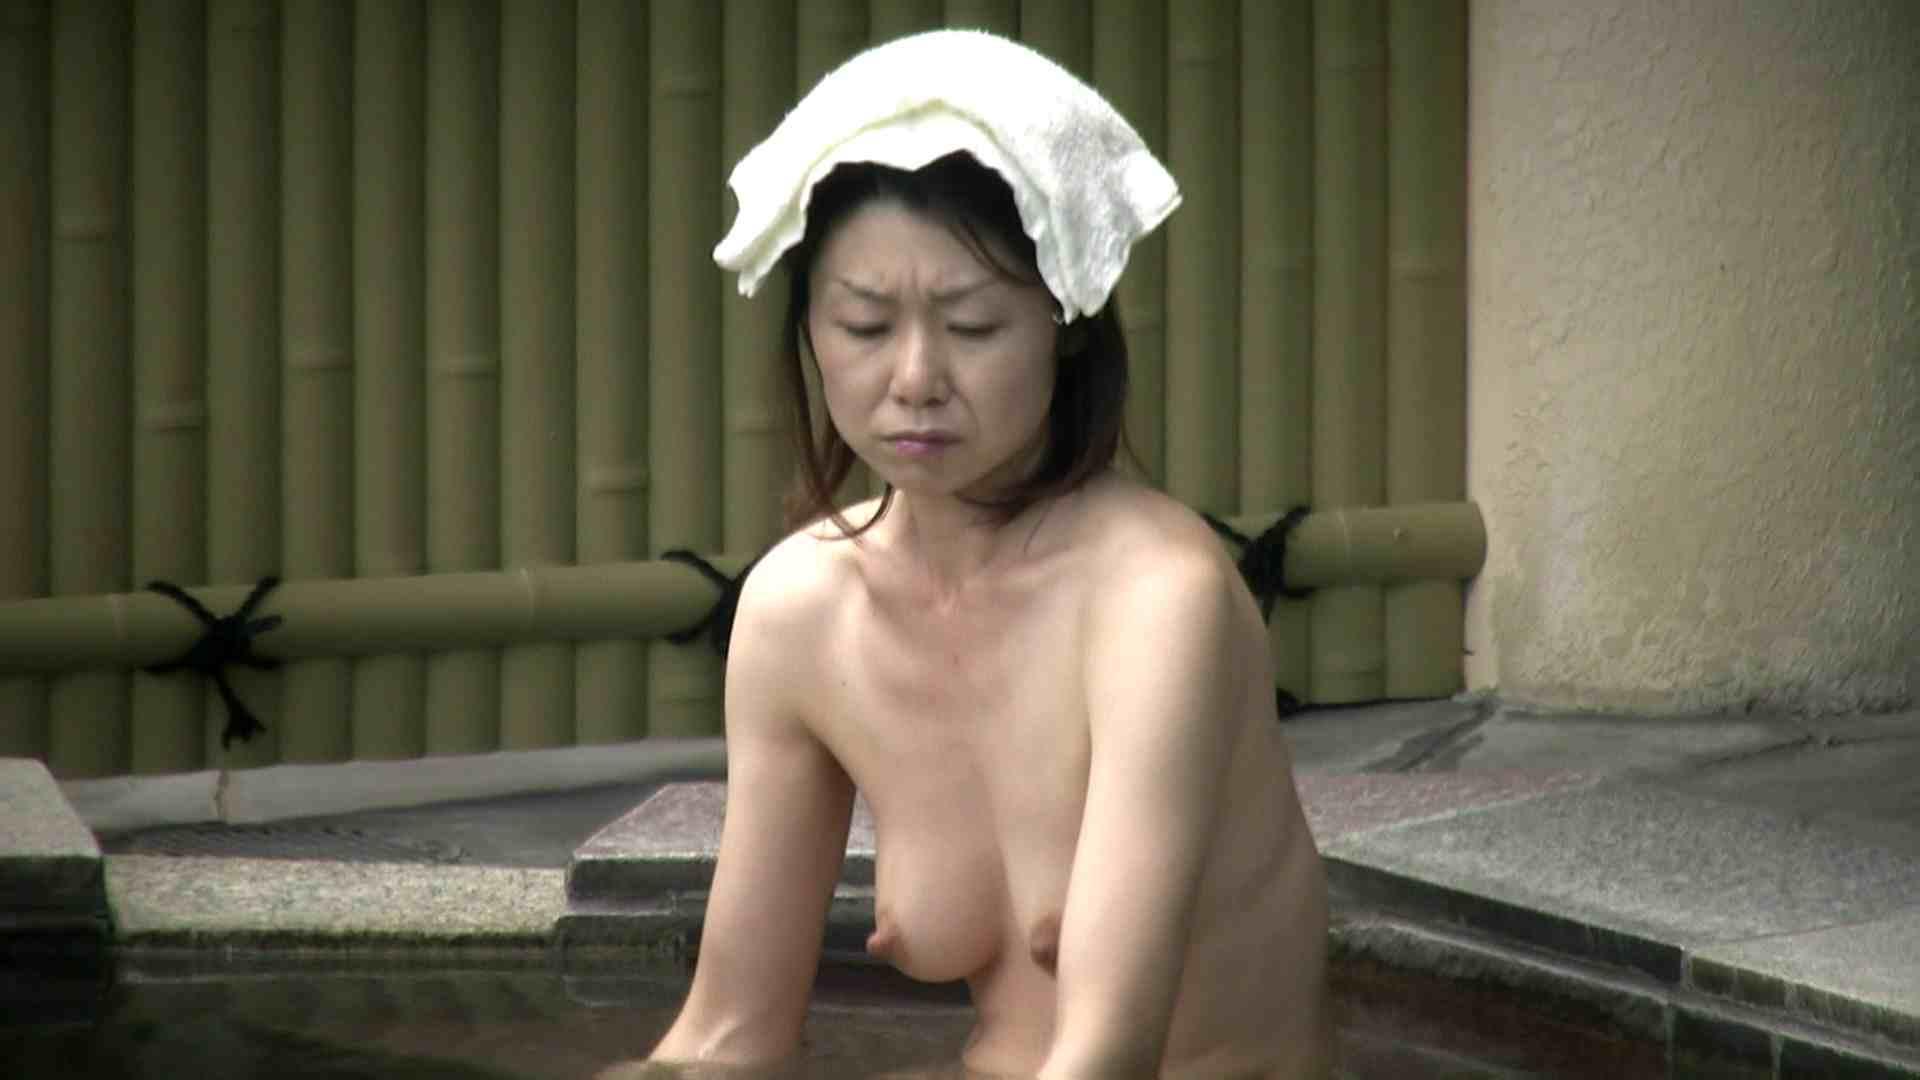 Aquaな露天風呂Vol.658 盗撮特撮 戯れ無修正画像 11pic 5